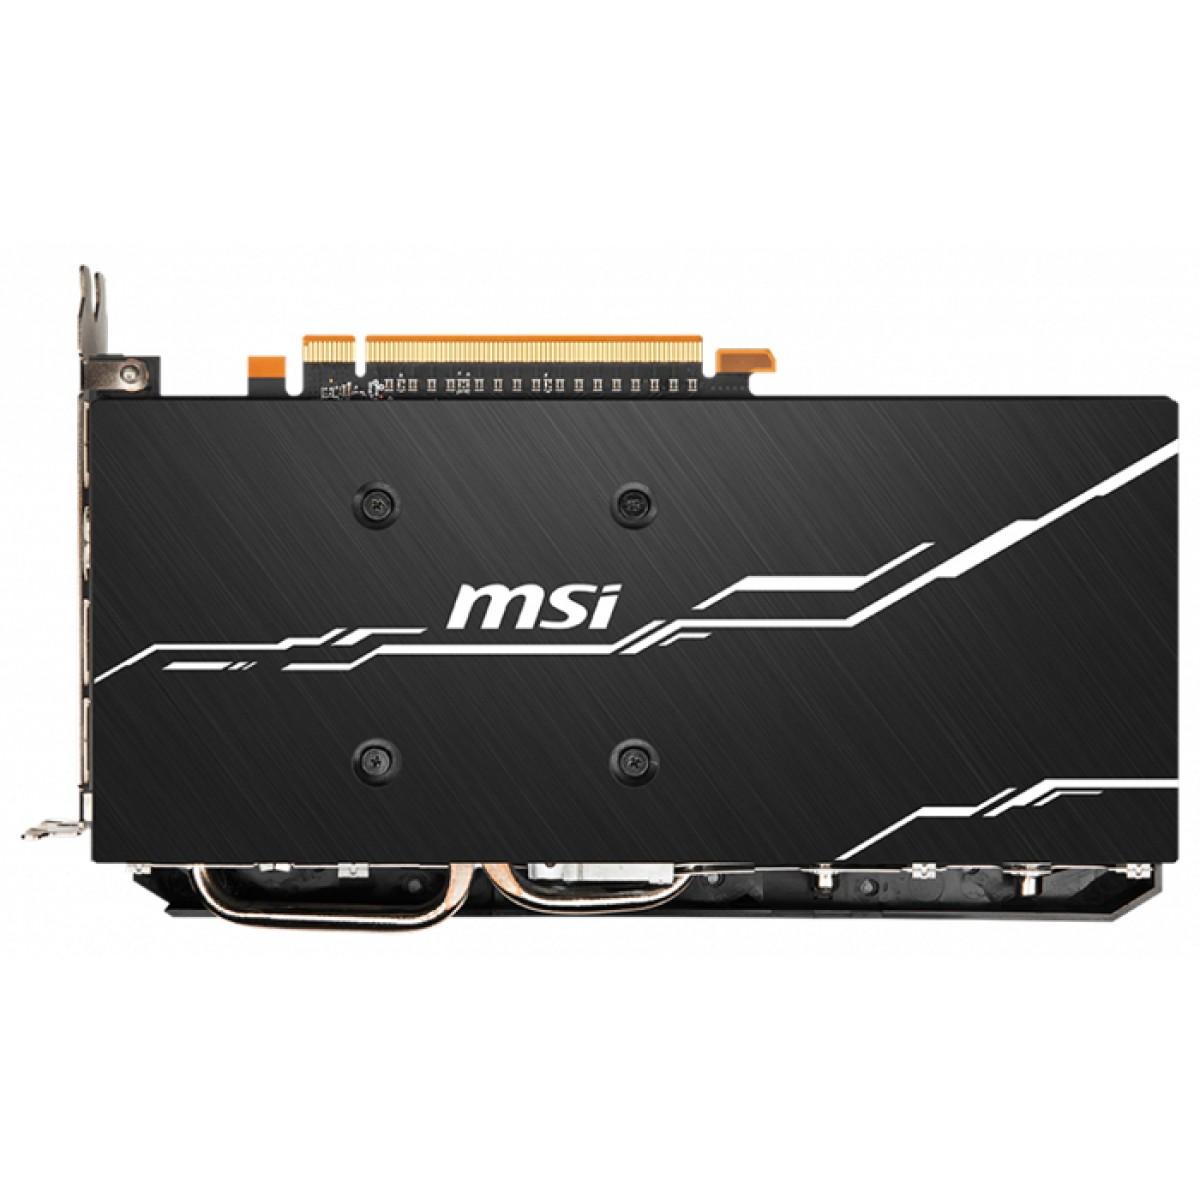 Placa de Vídeo MSI Radeon Navi RX 5700 Mech OC Dual, 8GB GDDR6, 256Bit, RX 5700 MECH OC